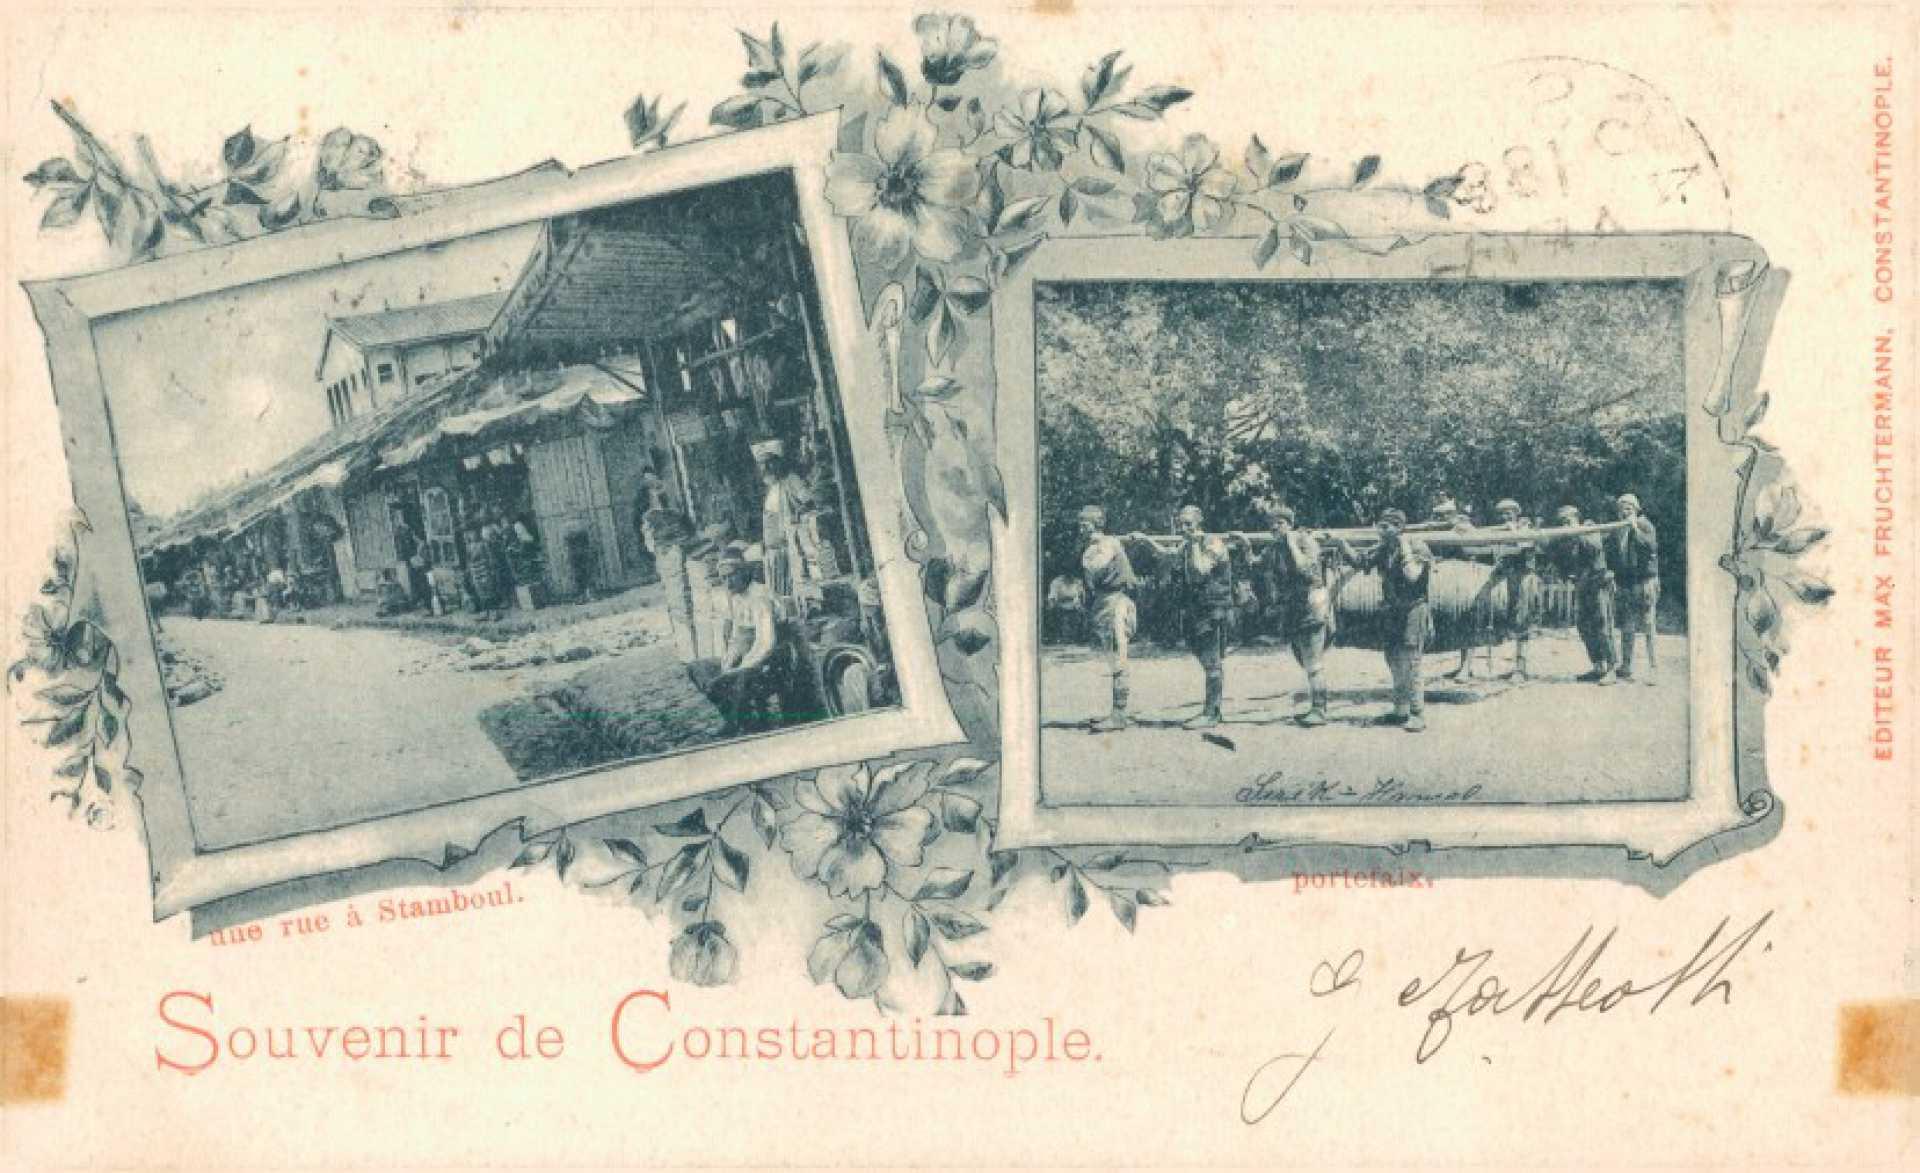 Une rue a Stamboul. portefaix